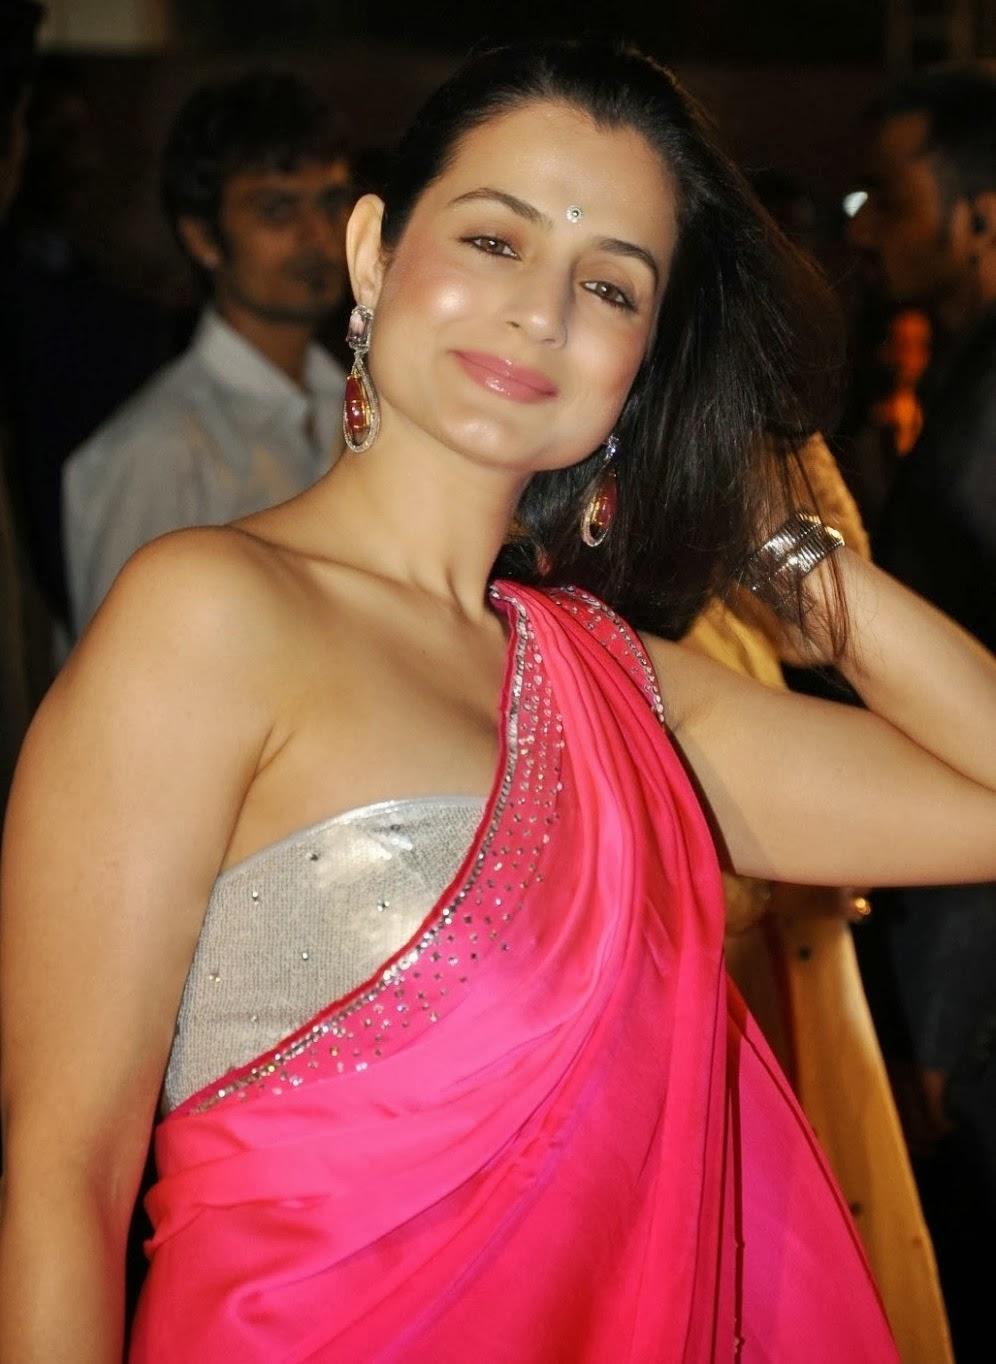 Amisha Patel Wedding Date - Ameesha Patel Fans